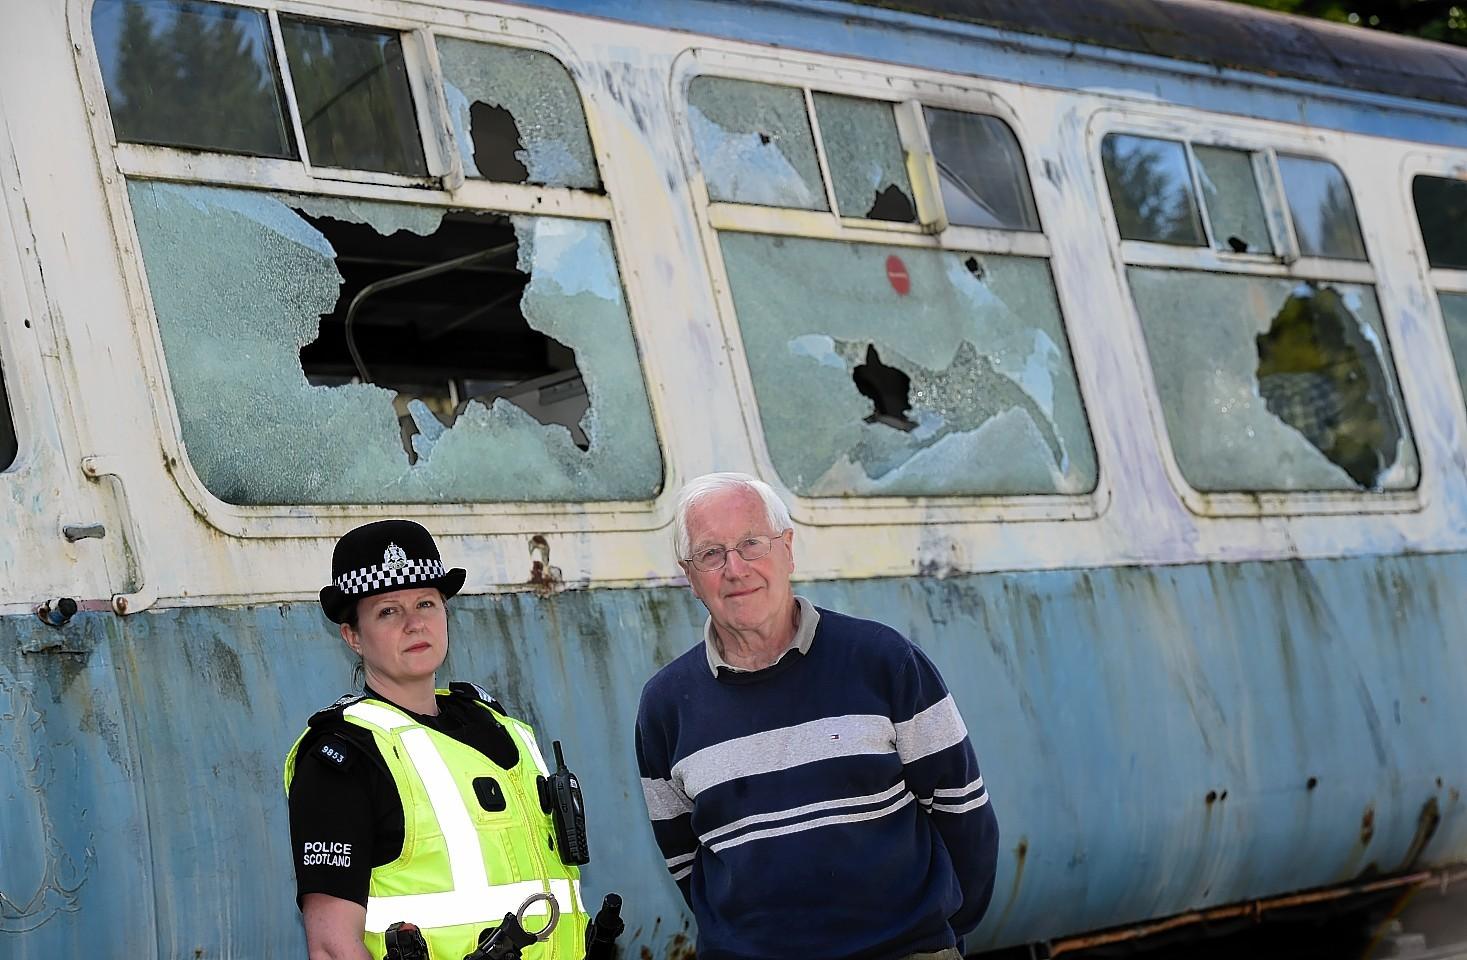 Police Scotland sgt Julie Stephen with Bill Halliday of the Royal Deeside railway team